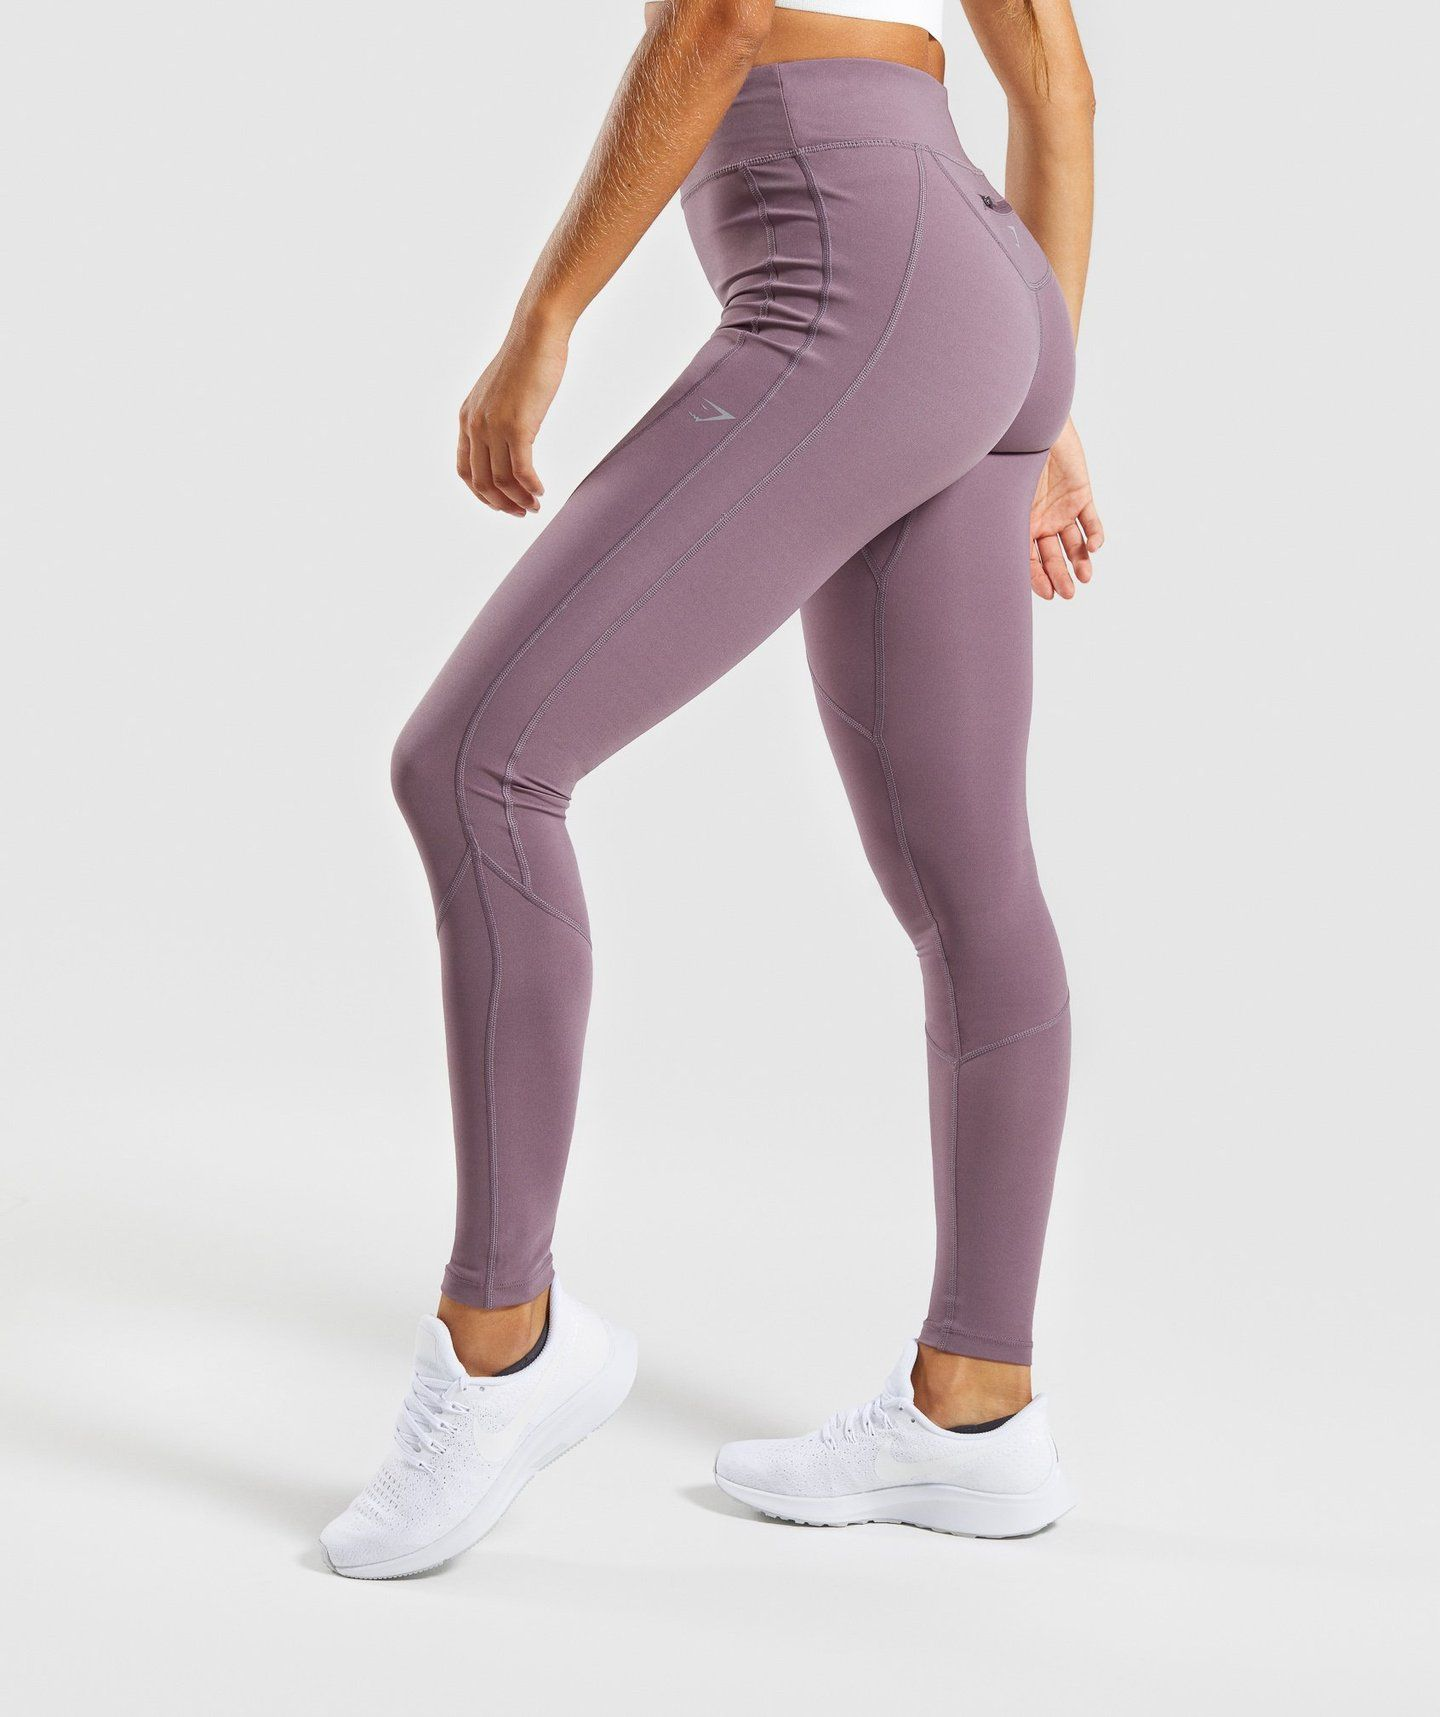 dd8dad83841c68 Gymshark Pace Running Leggings - Purple Wash | bottoms | Running ...